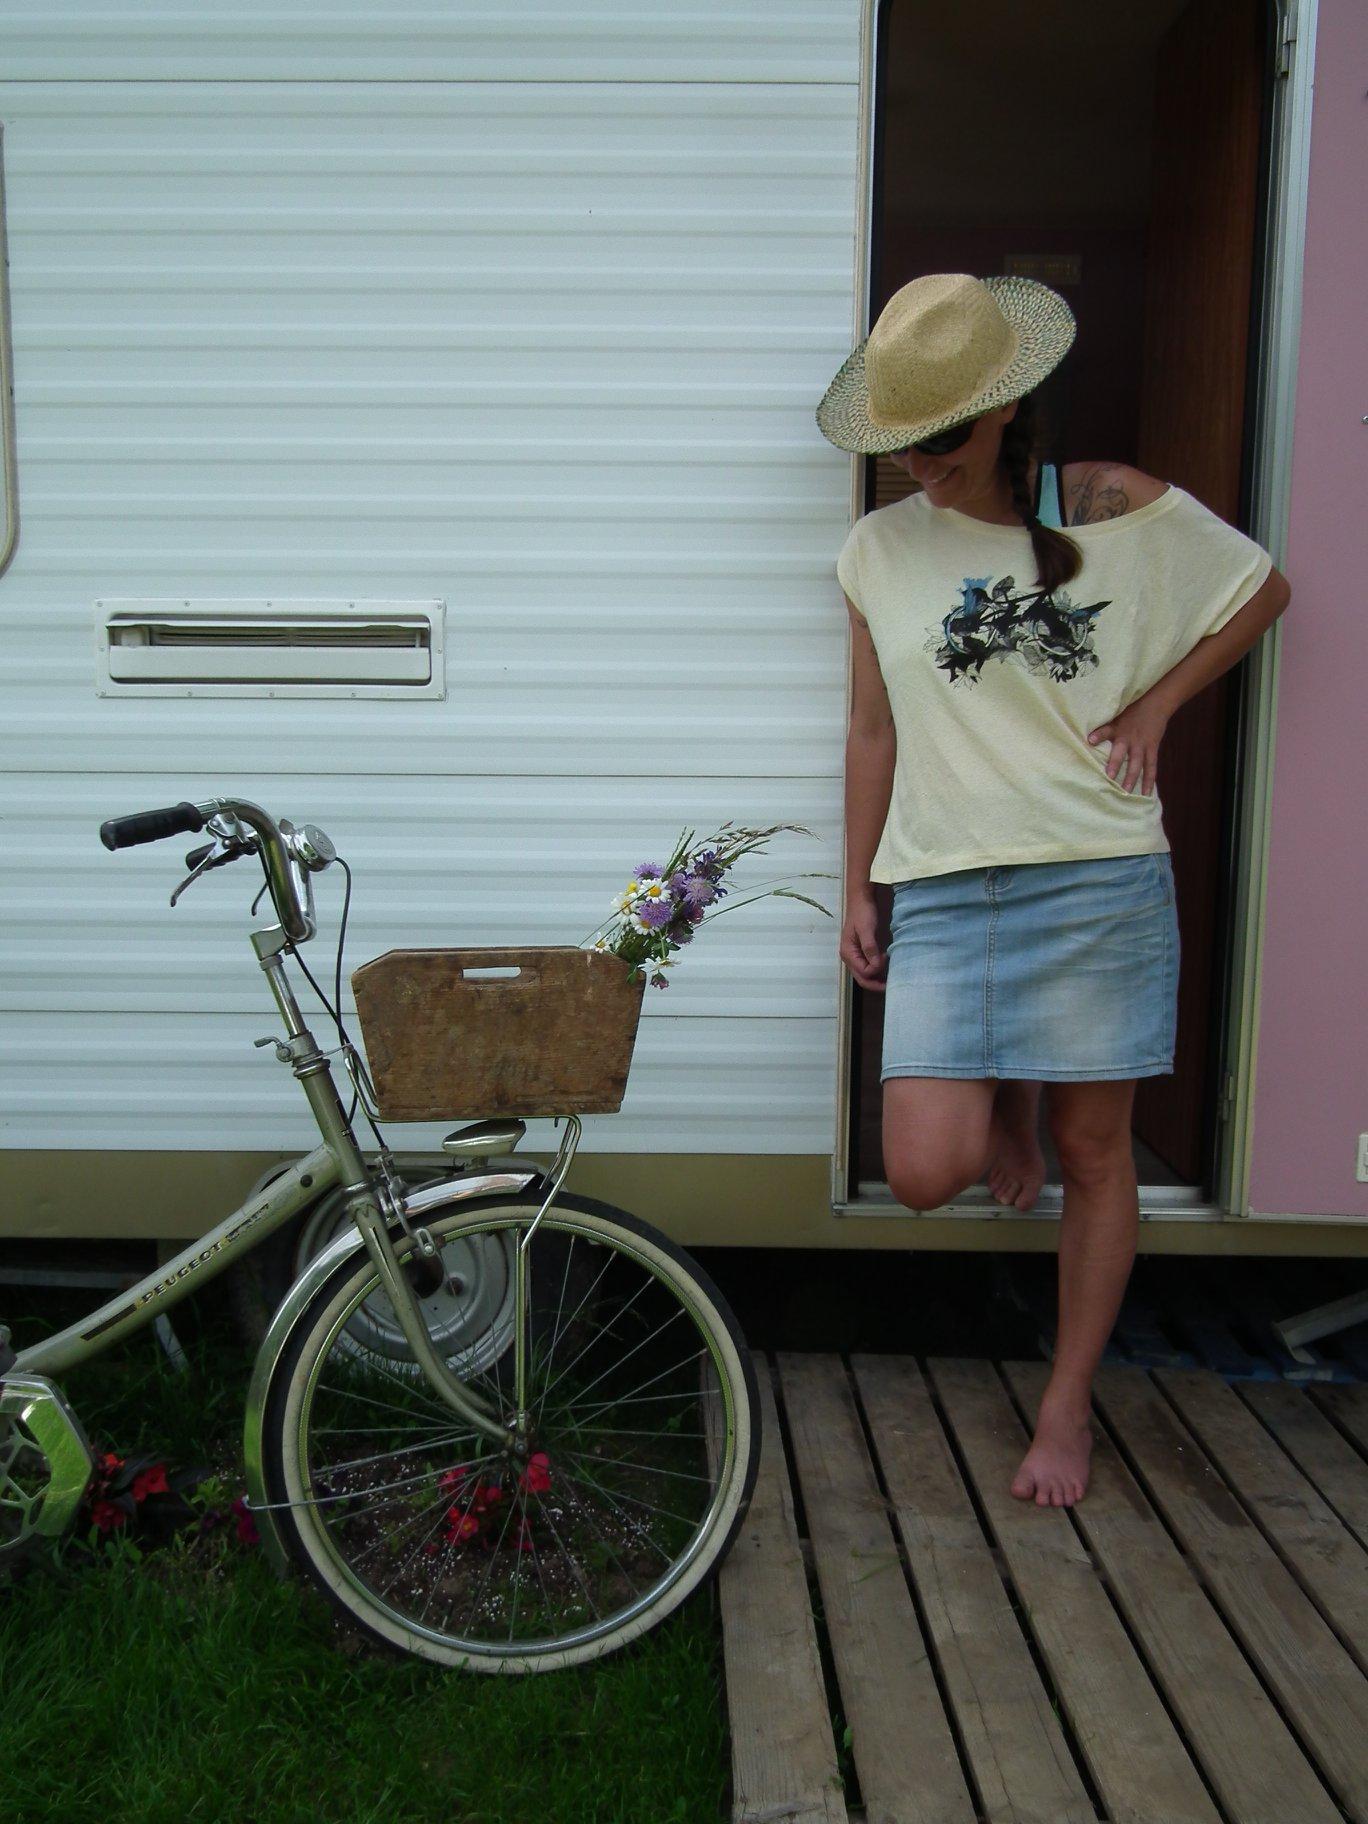 montagne-femme-vttiste-velo-saint_jean_darvey_bauges_savoie-bikettes